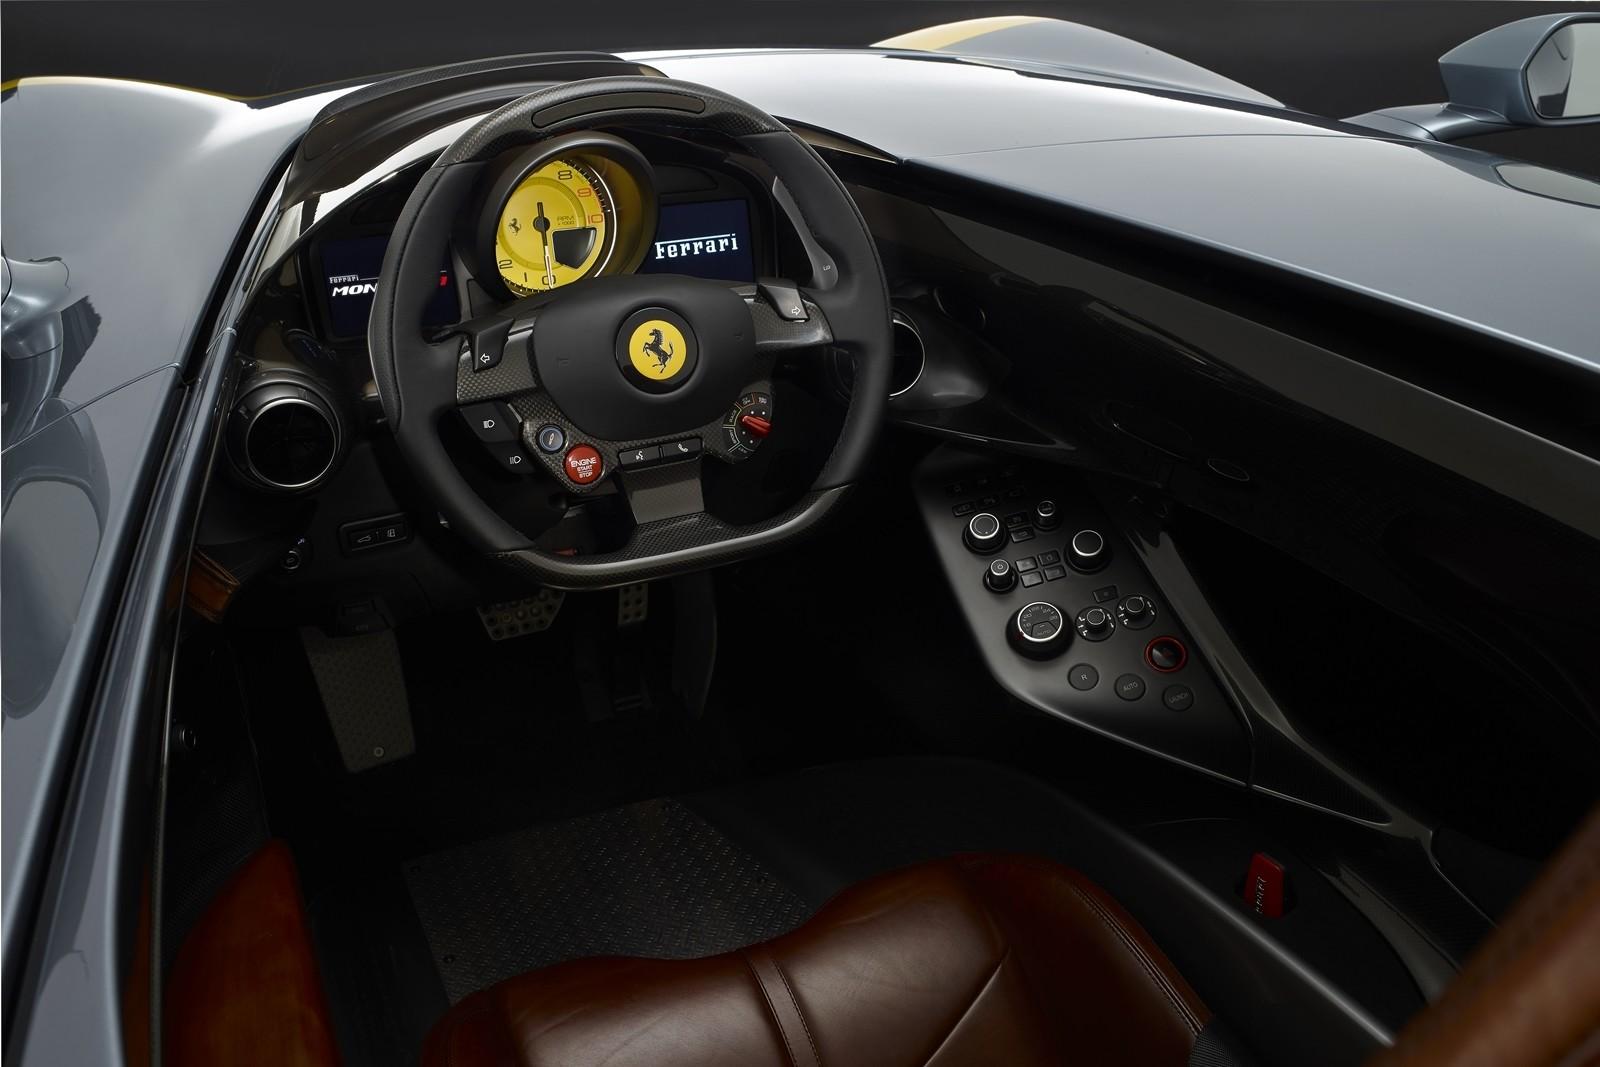 Foto de Ferrari Monza SP1 y Monza SP2 2019 (12/14)